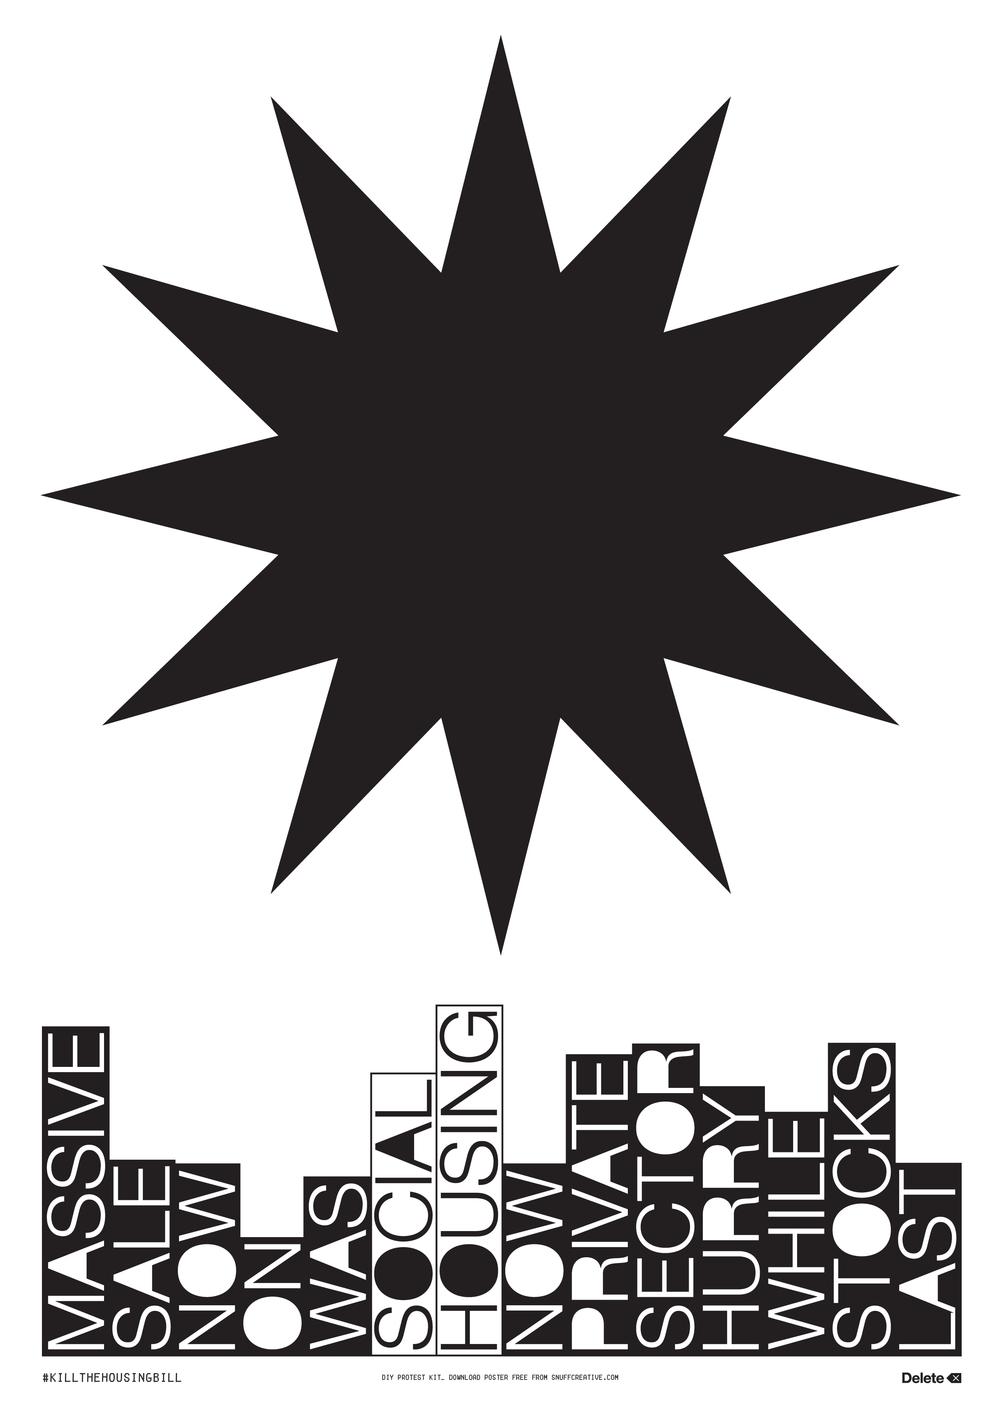 MASSIVE SALE TYPE POSTER_BLACK-01.jpg